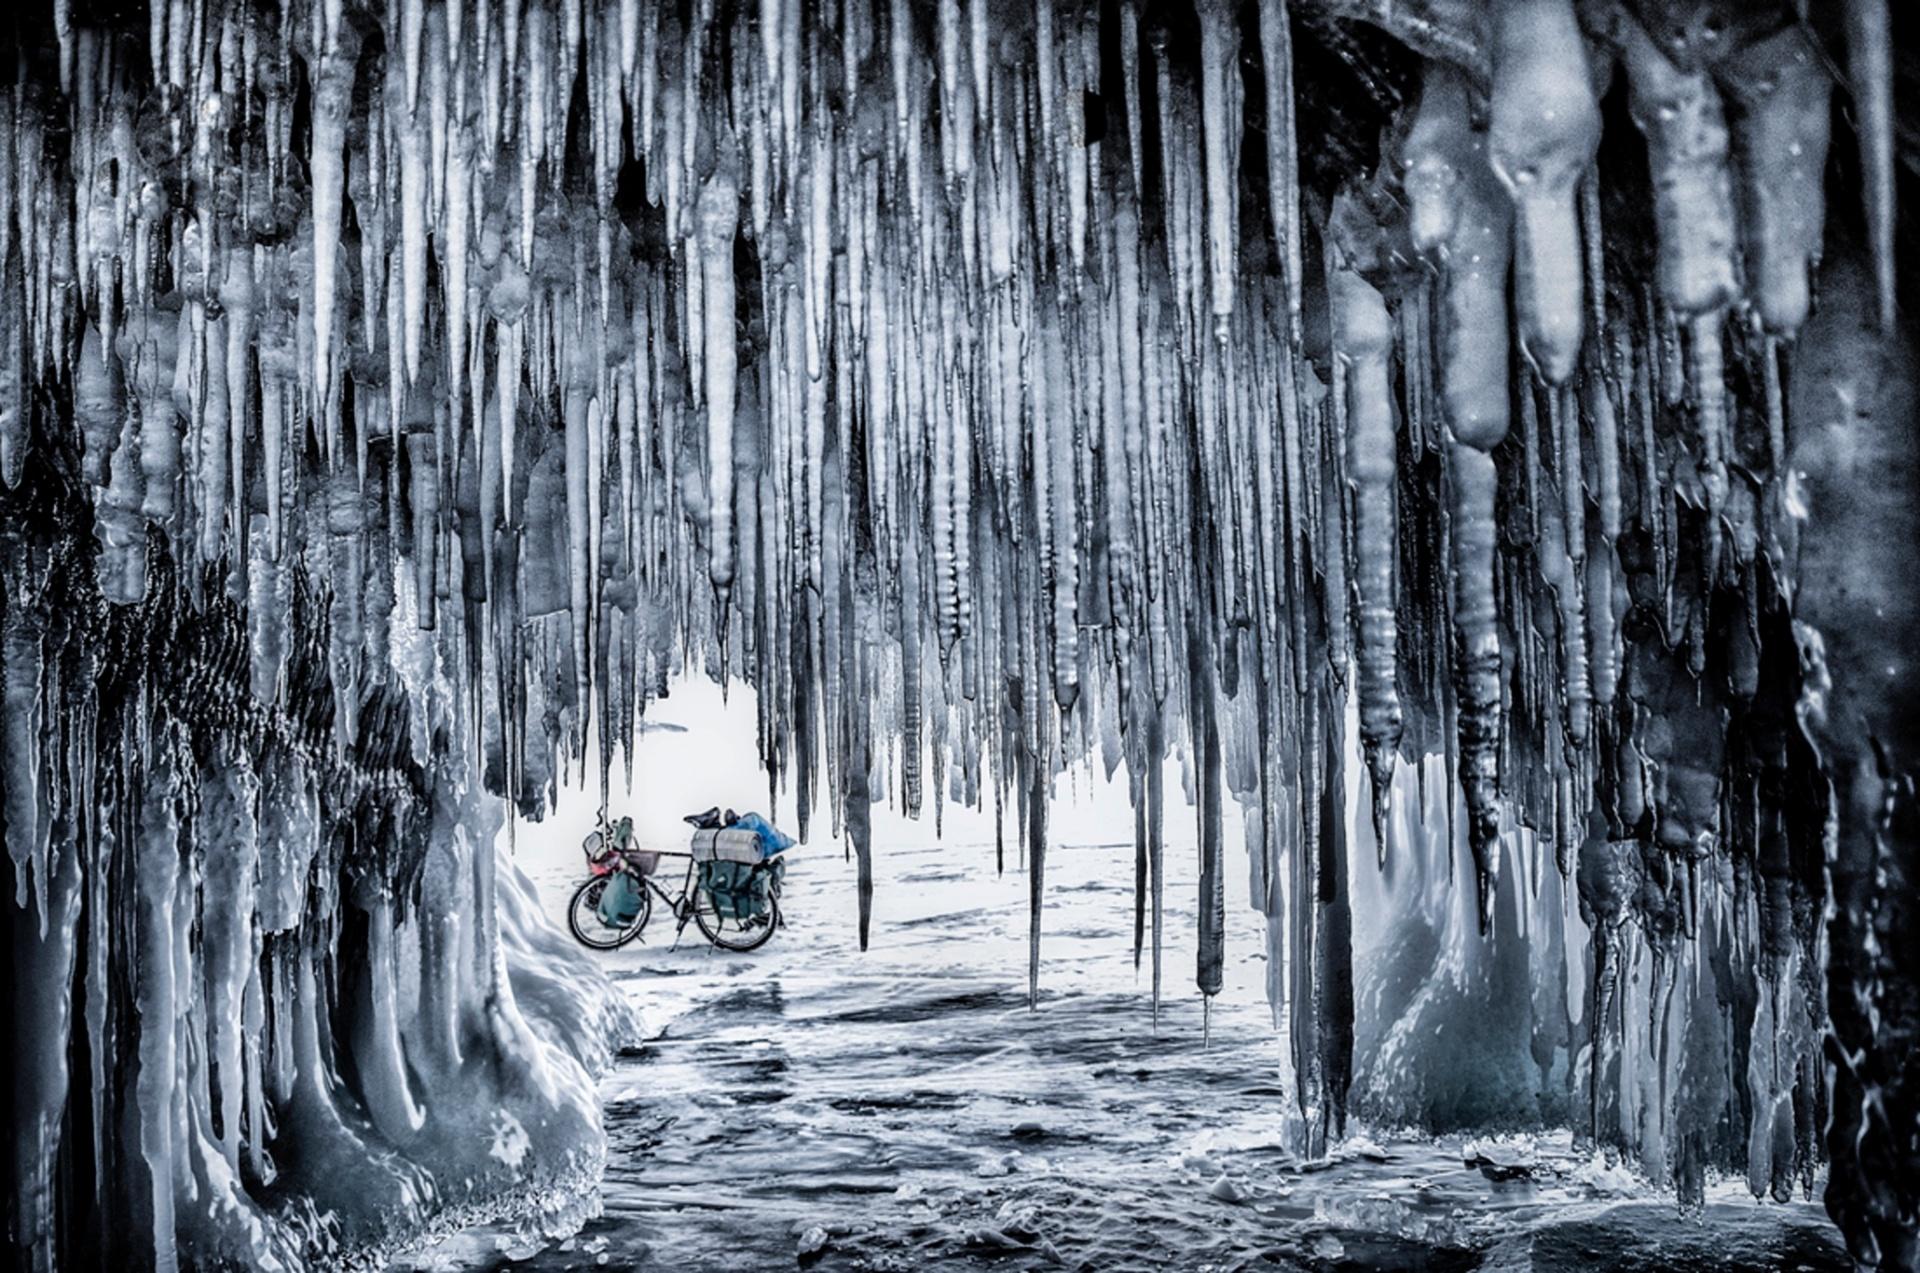 Earth, Air, Fire, Water, winner, best single image, Jakub Rybicki, Poland On a 800km bicycle journey across Baikal Lake, Ogoy Island, Russia Photograph: Jakub Rybicki/TPOTY